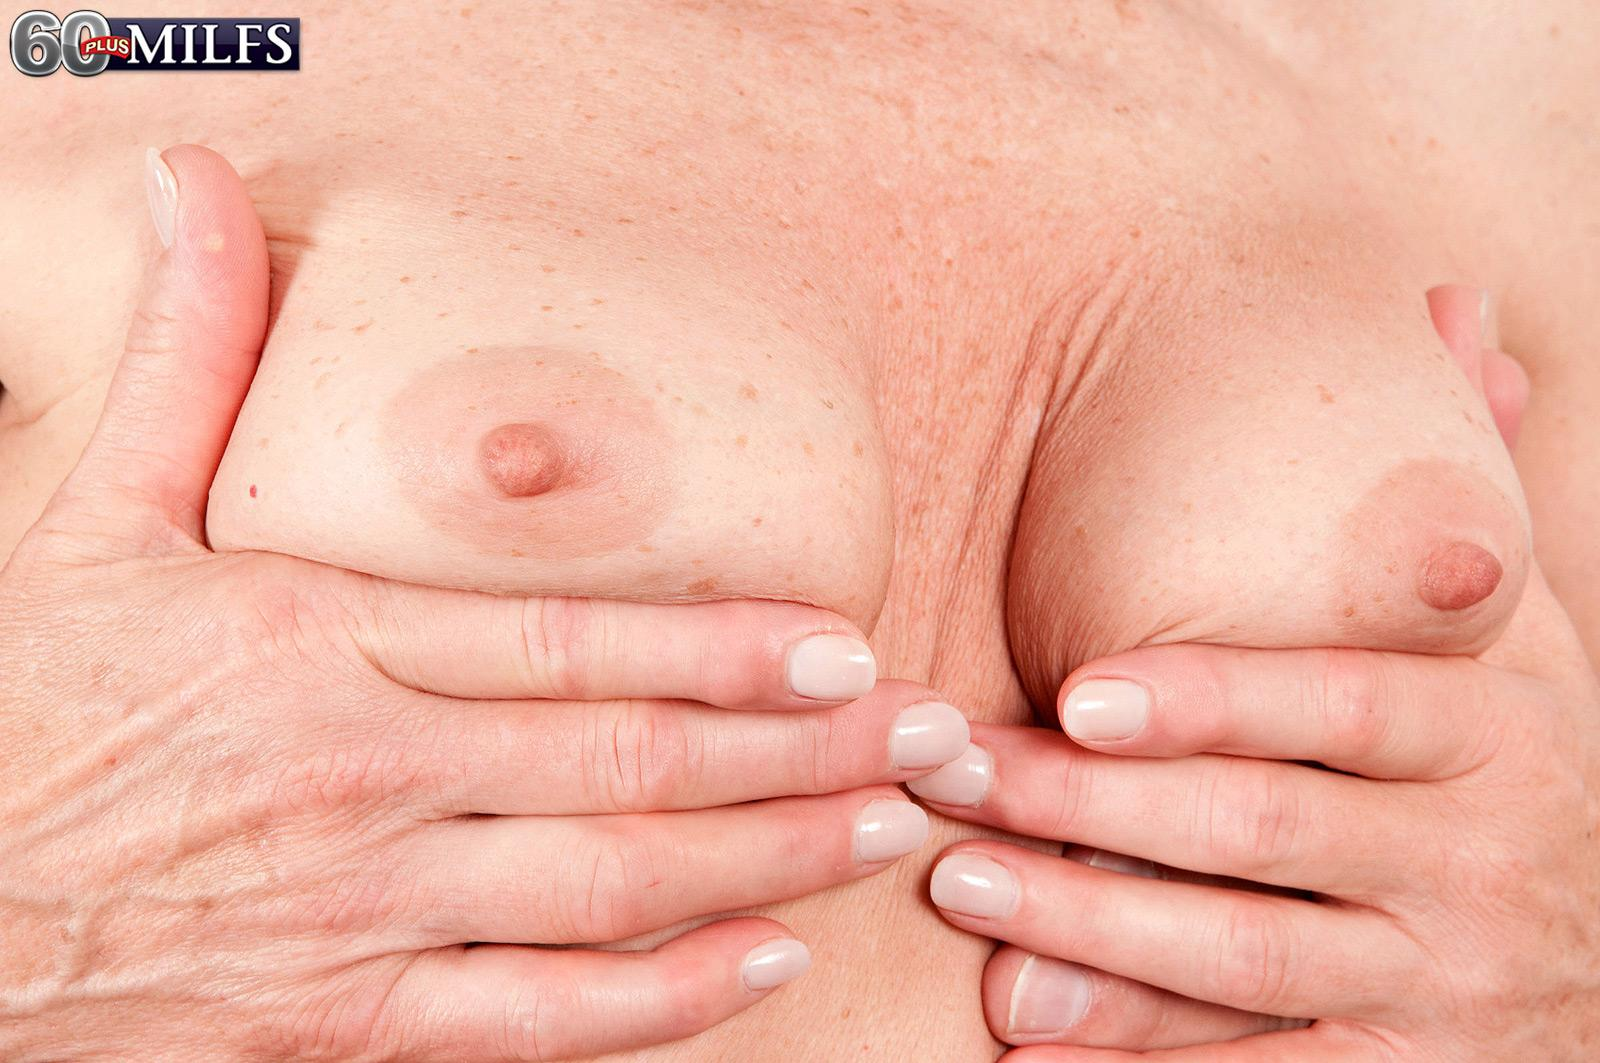 Pantyhose clad grandma Donna Davidson disrobed for sex by junior man